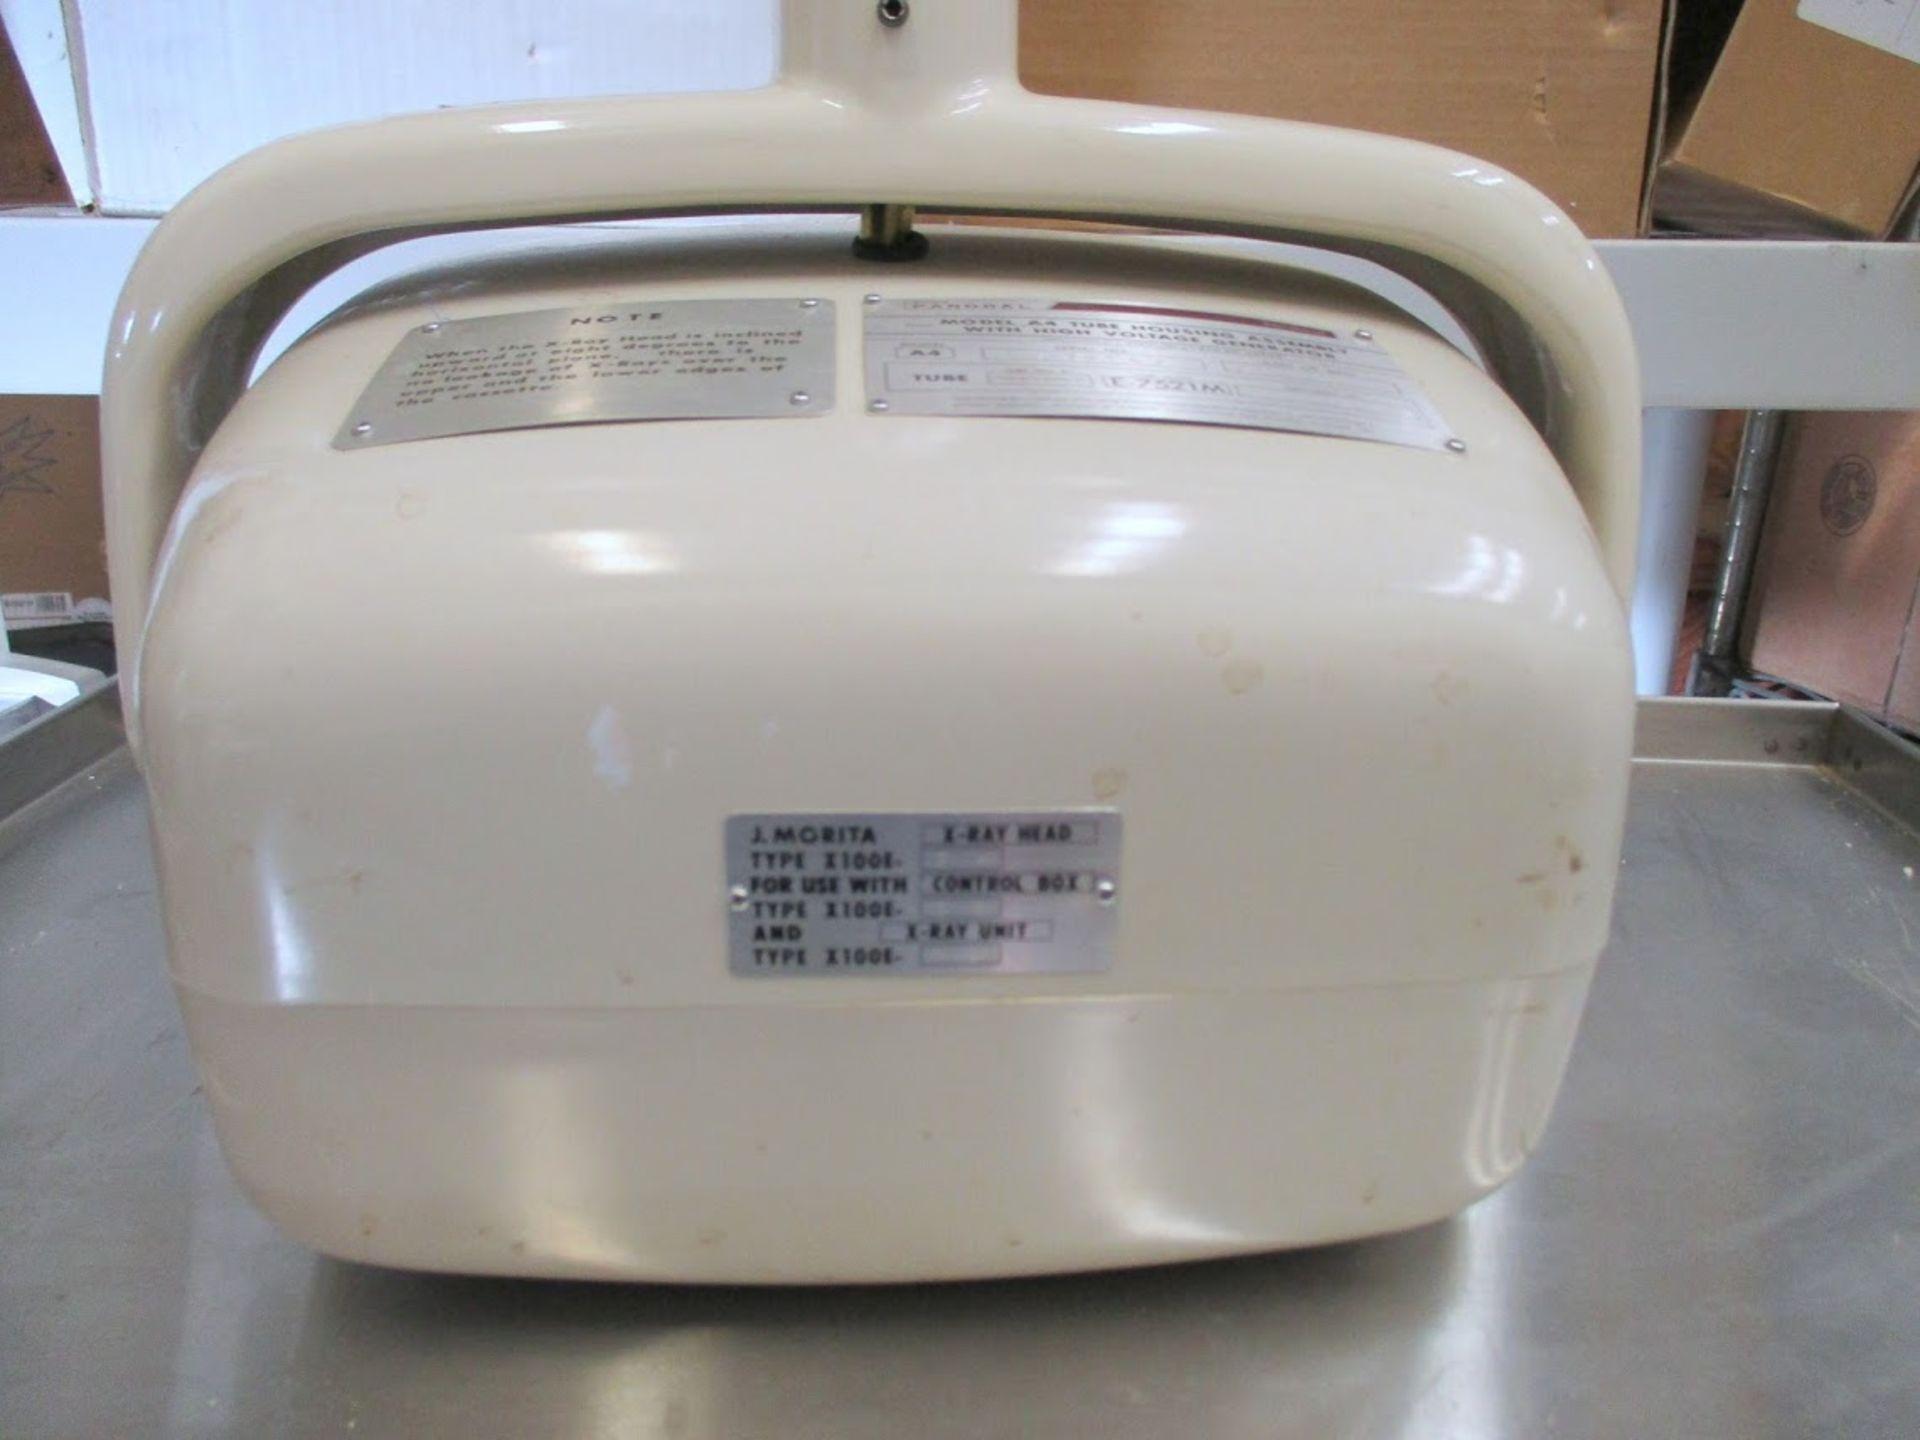 Jay Morita X-Ray Head Type X-100E-SH Ritter Model A4 housing. - Image 3 of 7